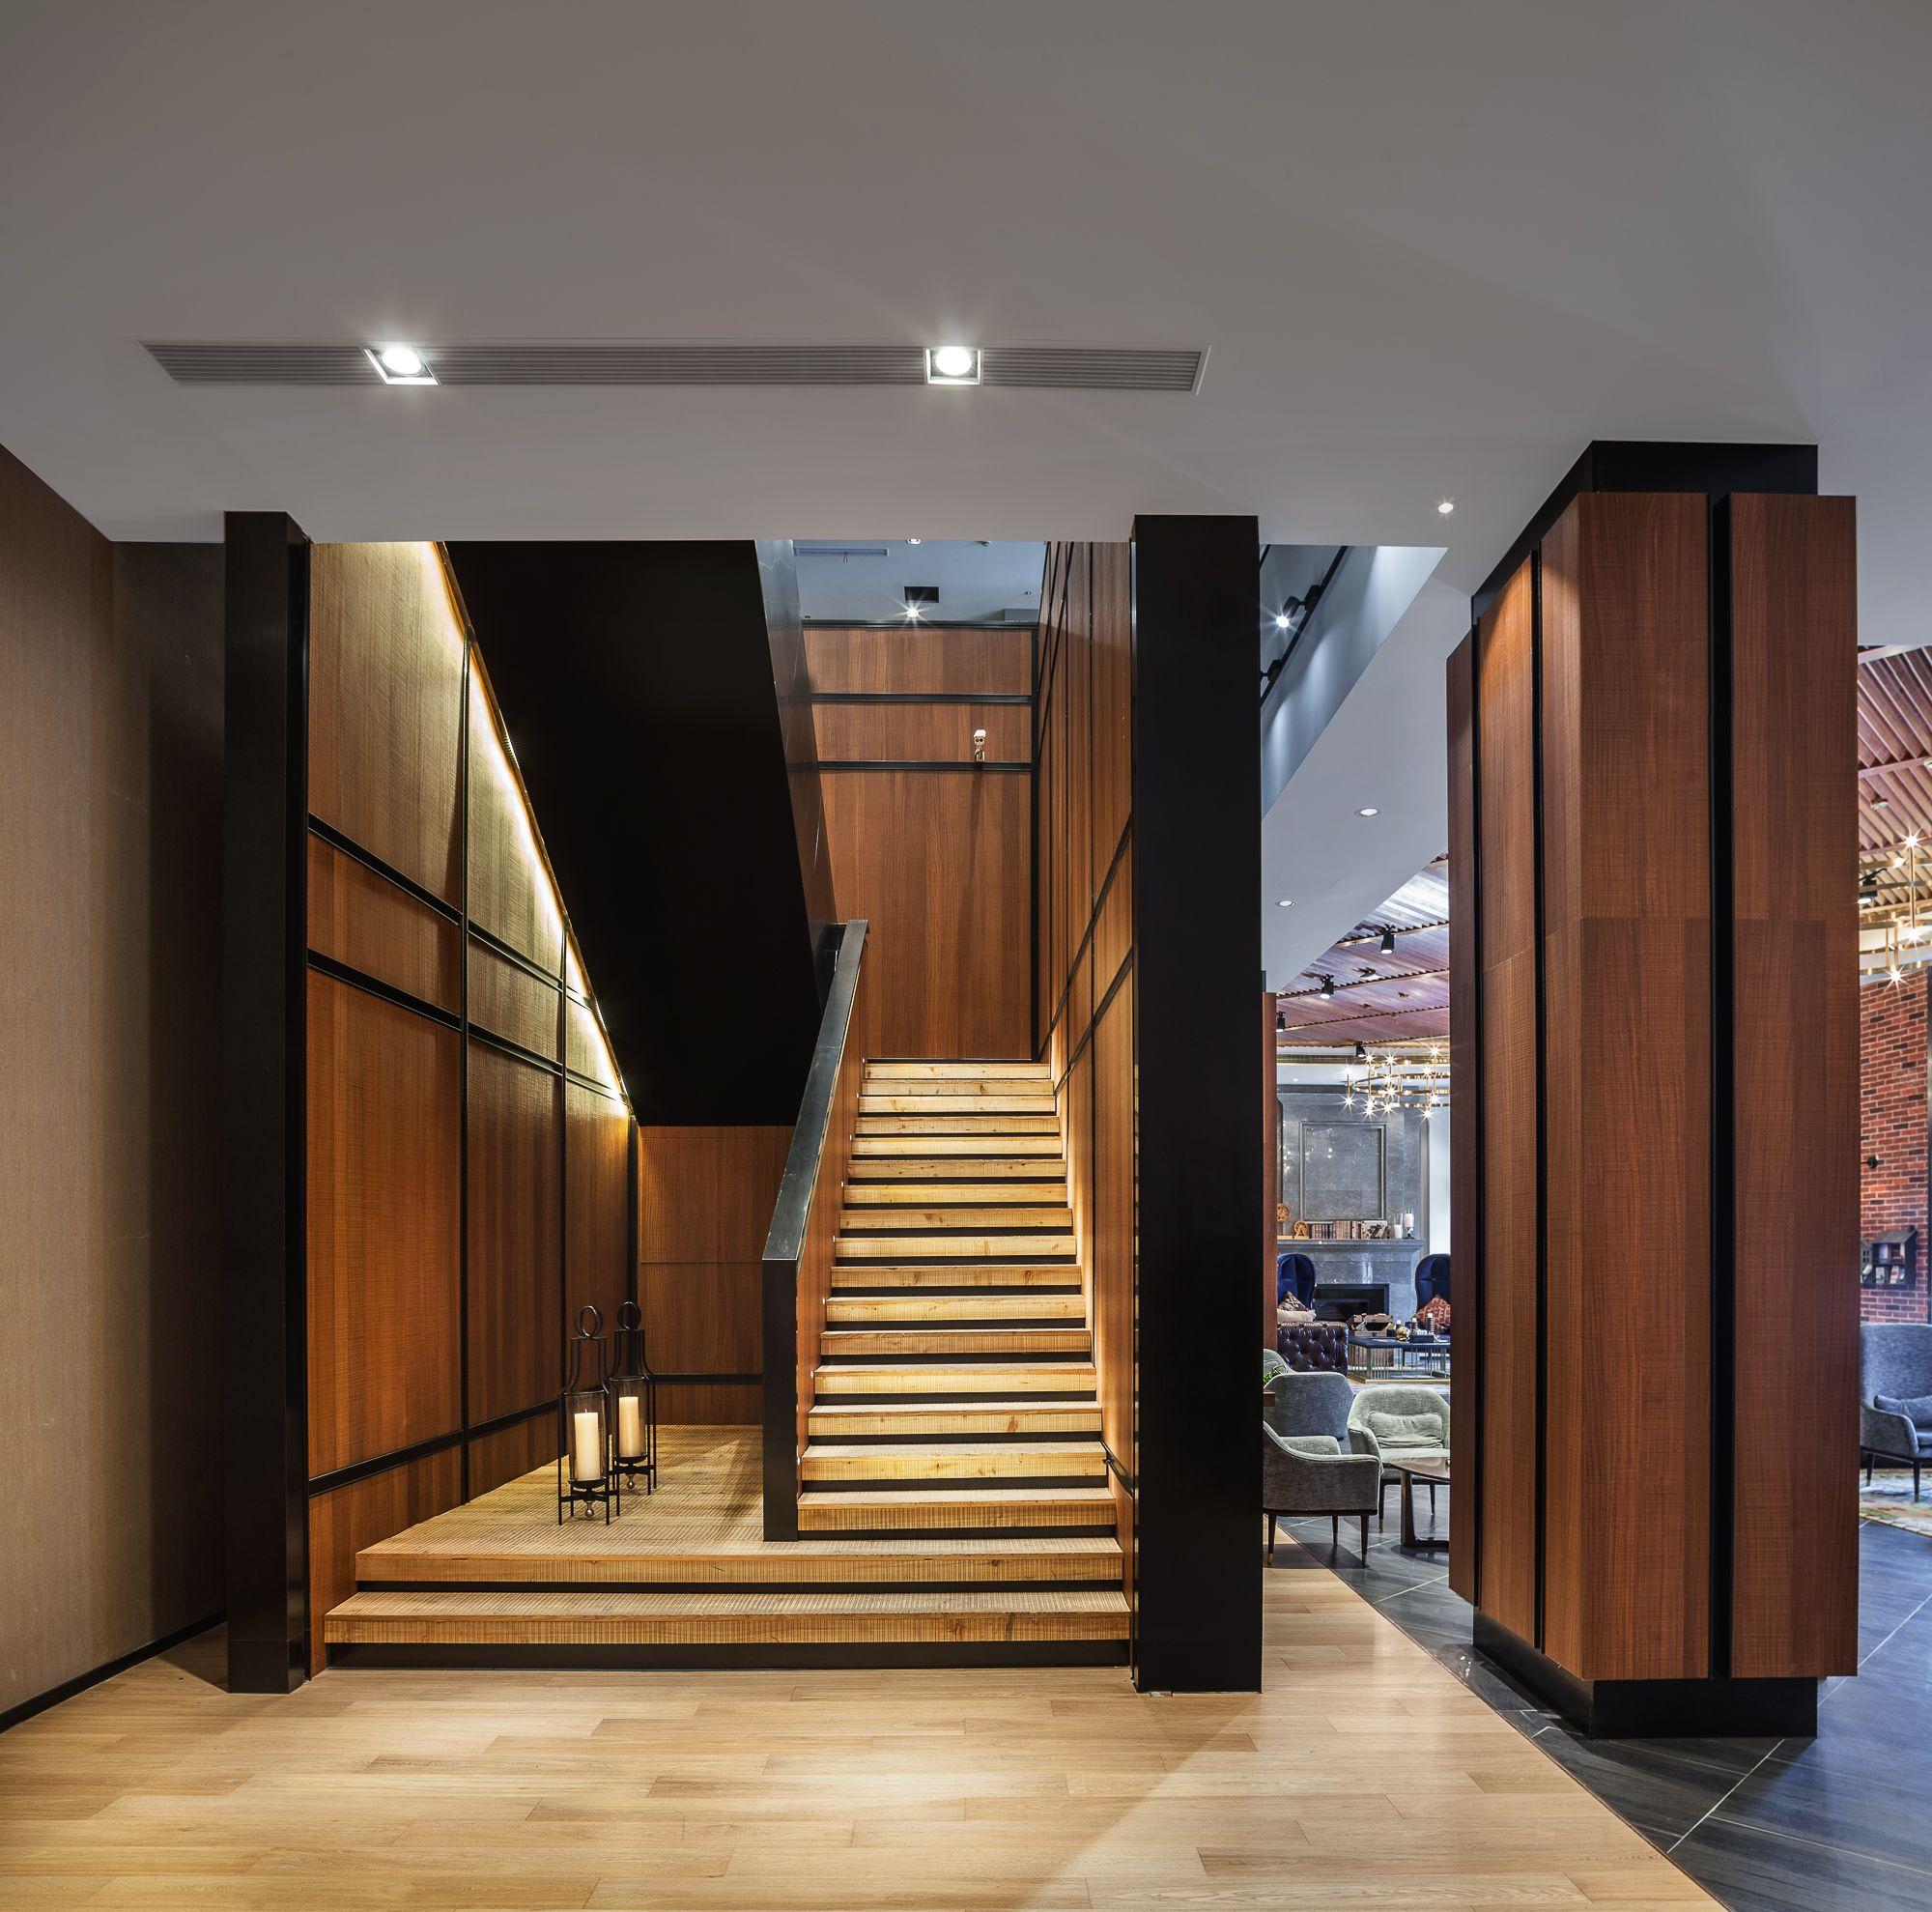 Stair Designs Railings Jam Stairs Amp Railing Designs: DOME&ASSOCIATES Www.domecn.com